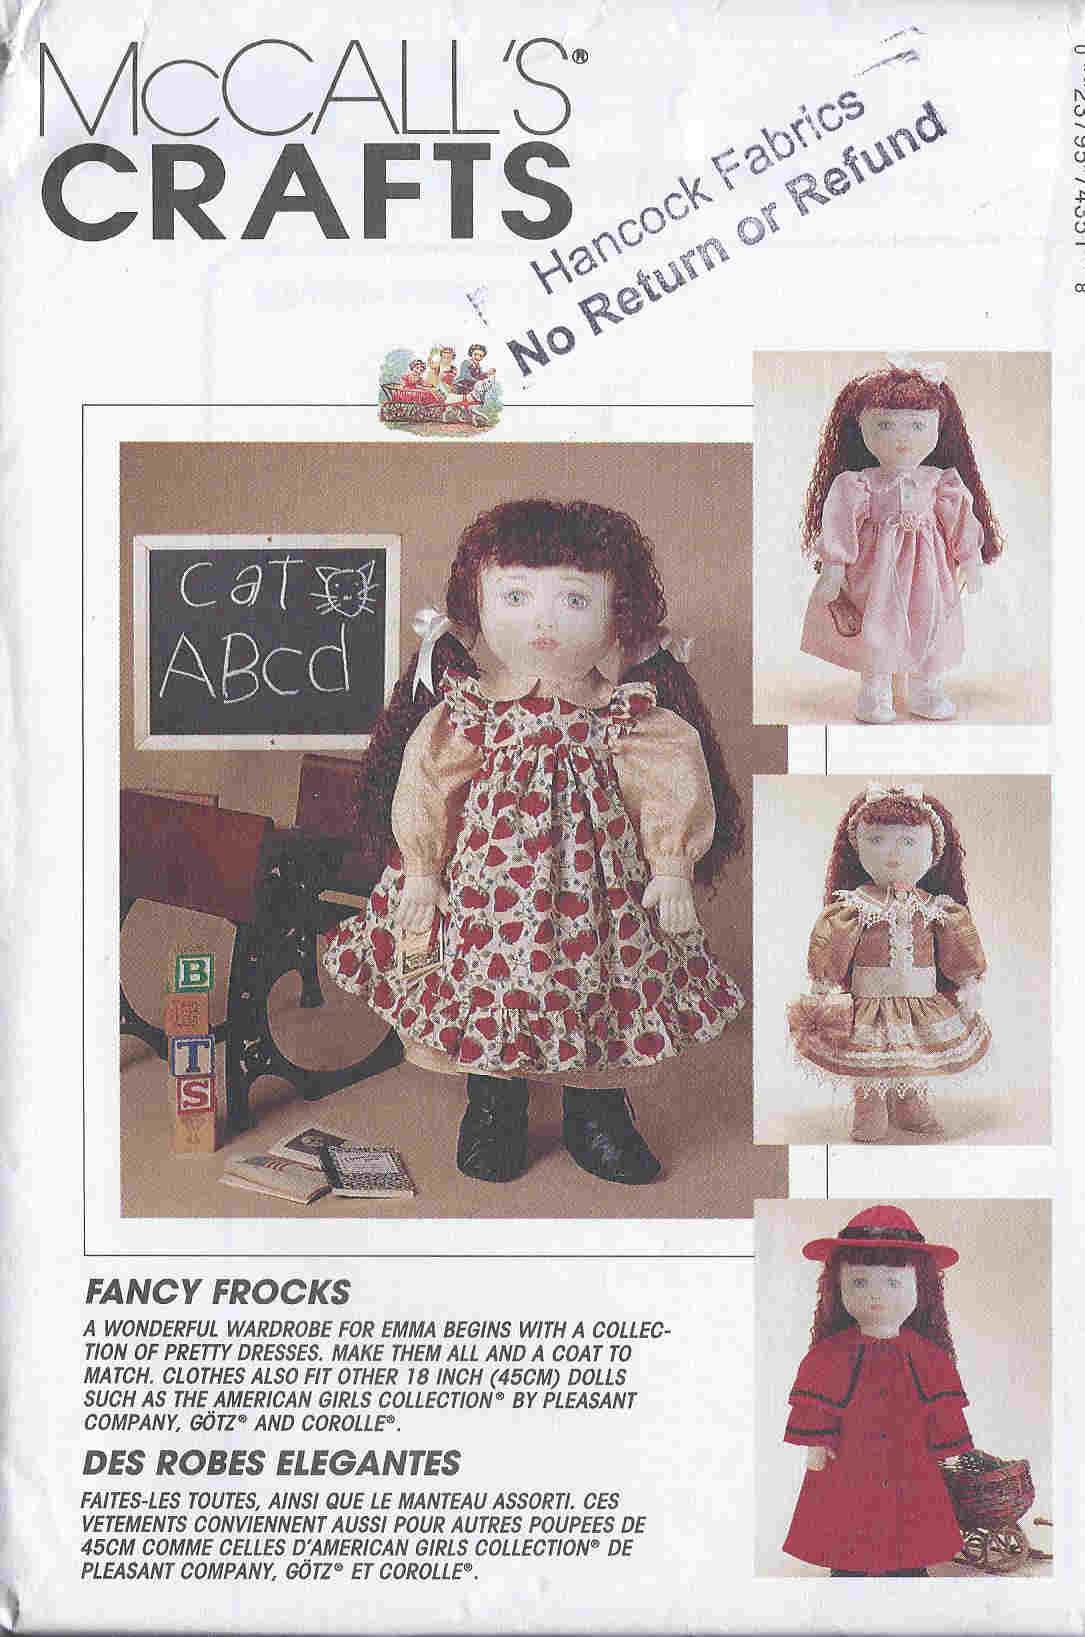 Dellajane sewing patterns 18 doll american girl sewing patterns fancy frocks emma sewing pattern jeuxipadfo Gallery